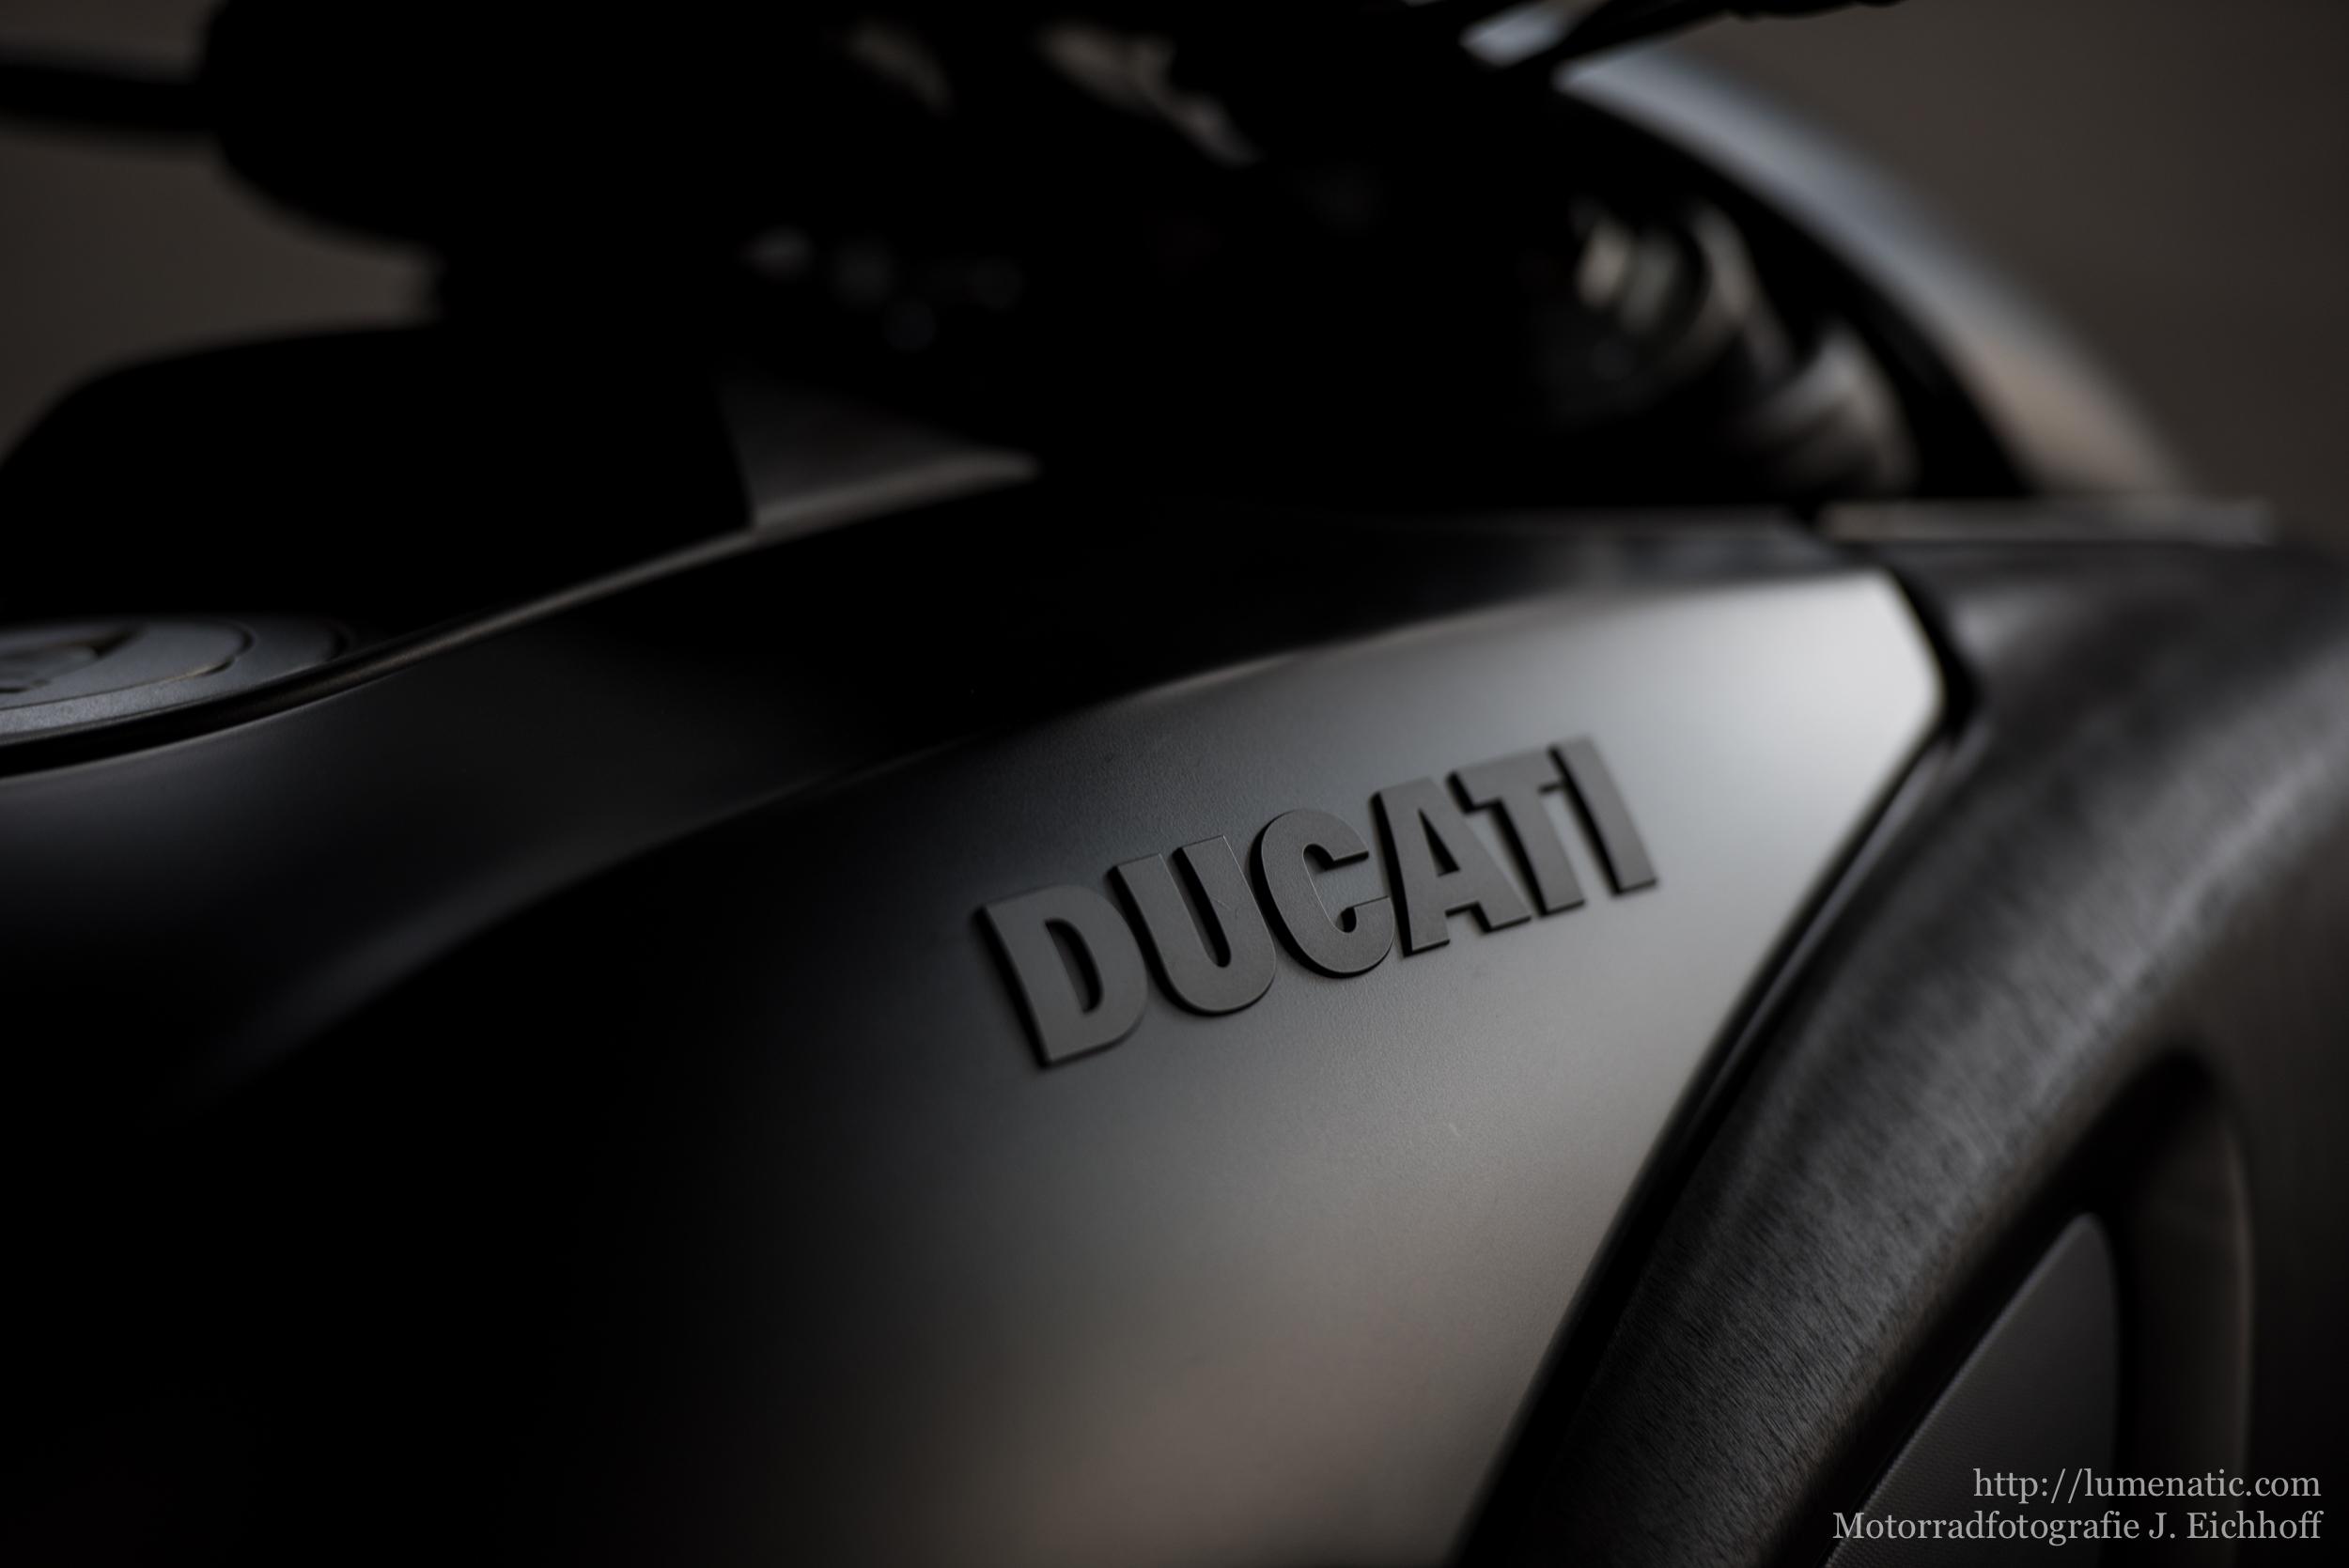 20170225-Ducati-Diavel-010